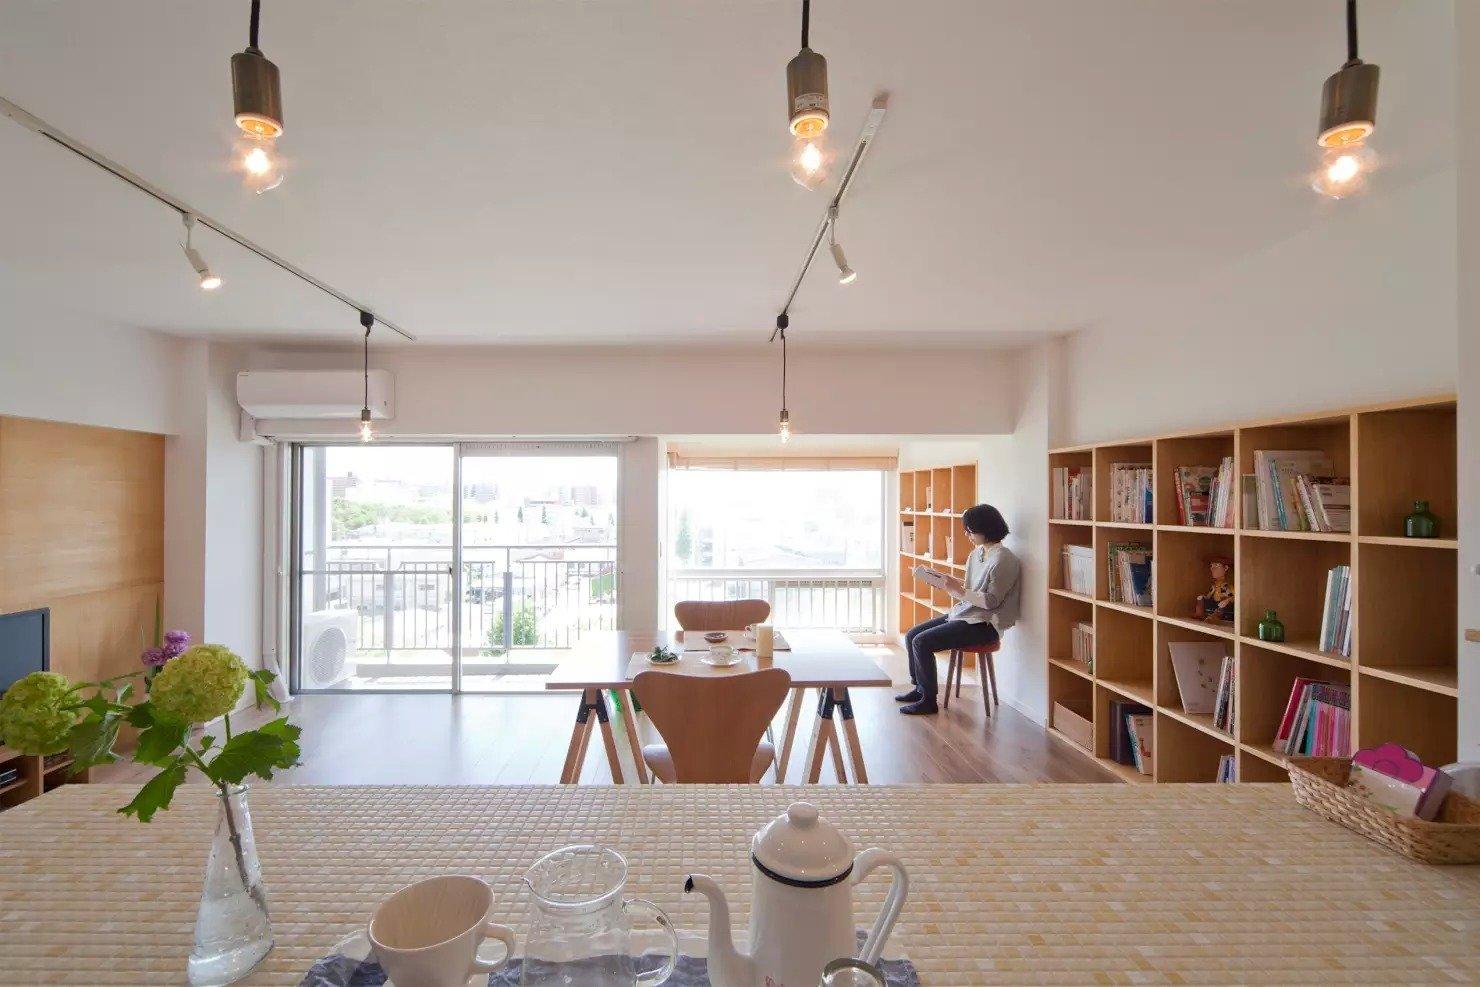 Book Cafe House